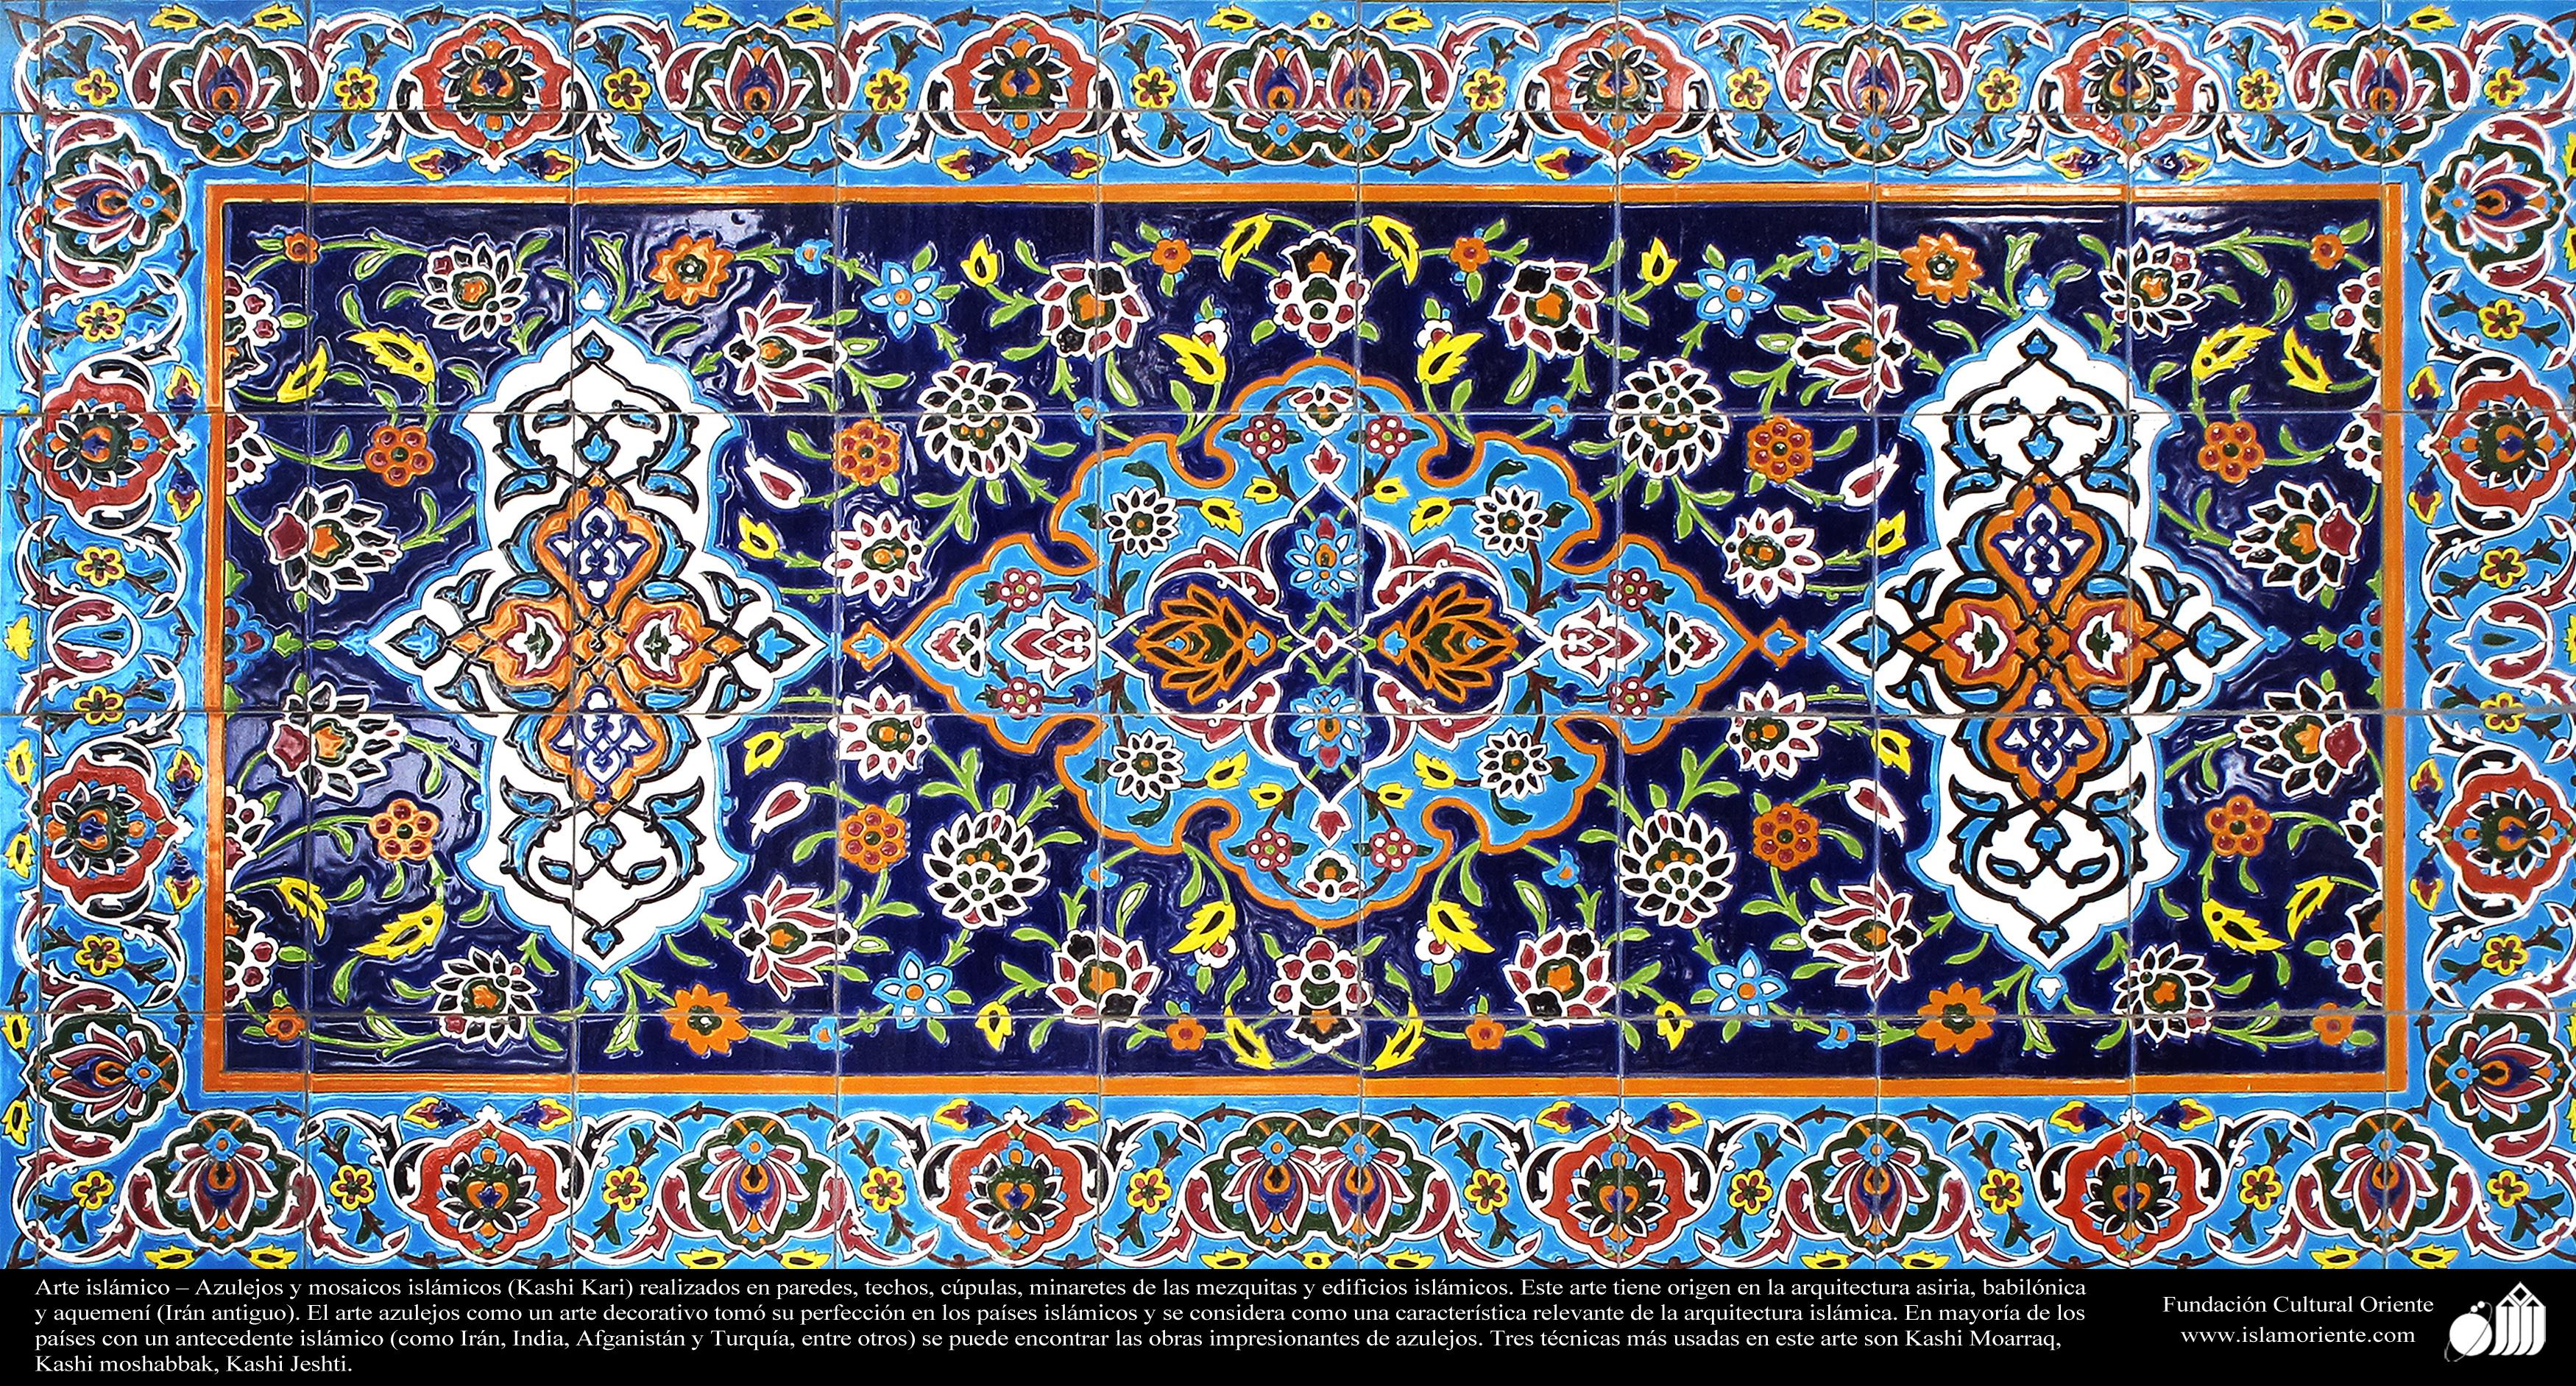 mosaicos azulejos